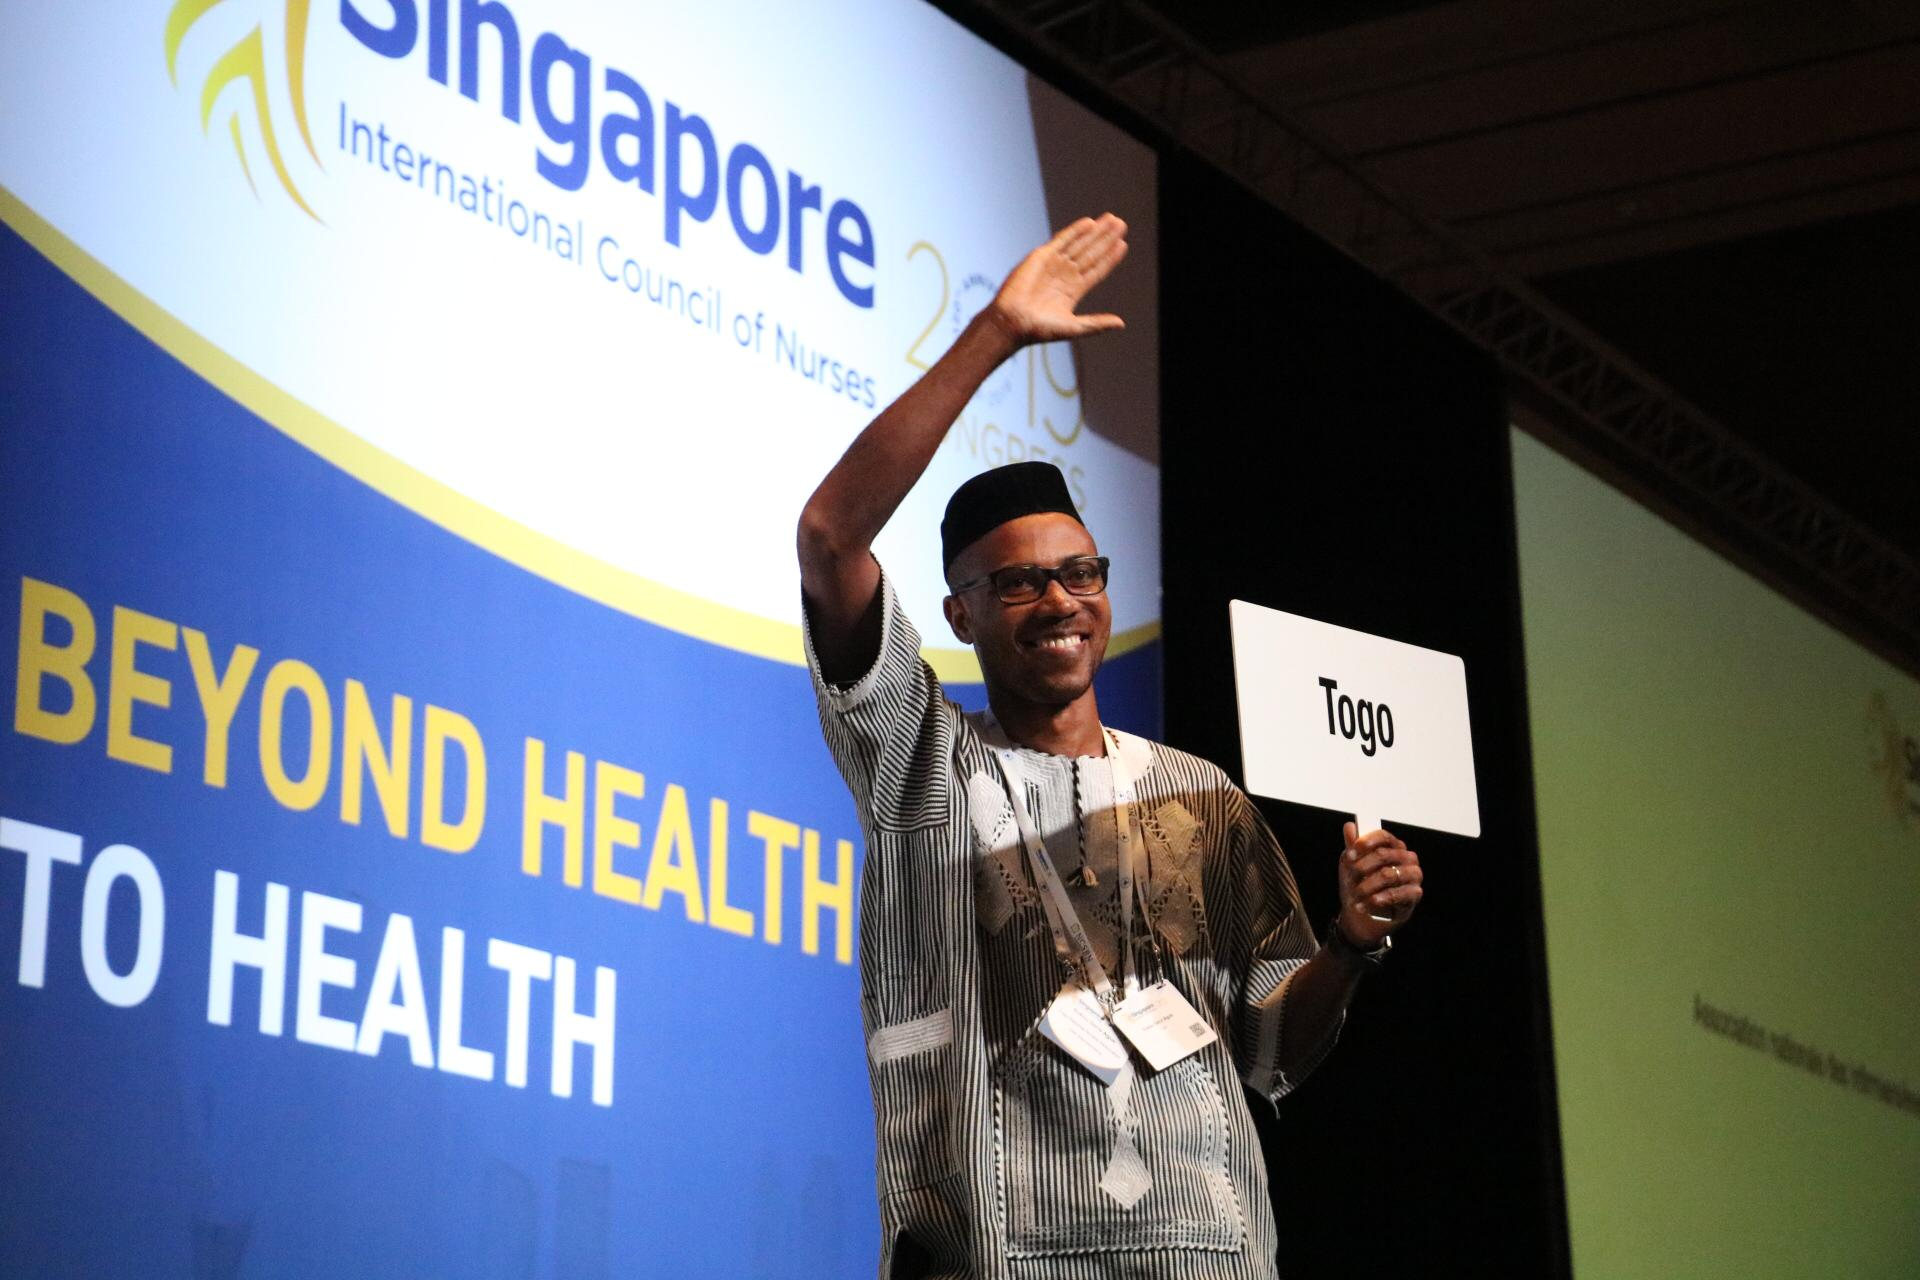 ICN Congress 2019 Singapore | ICN - International Council of Nurses